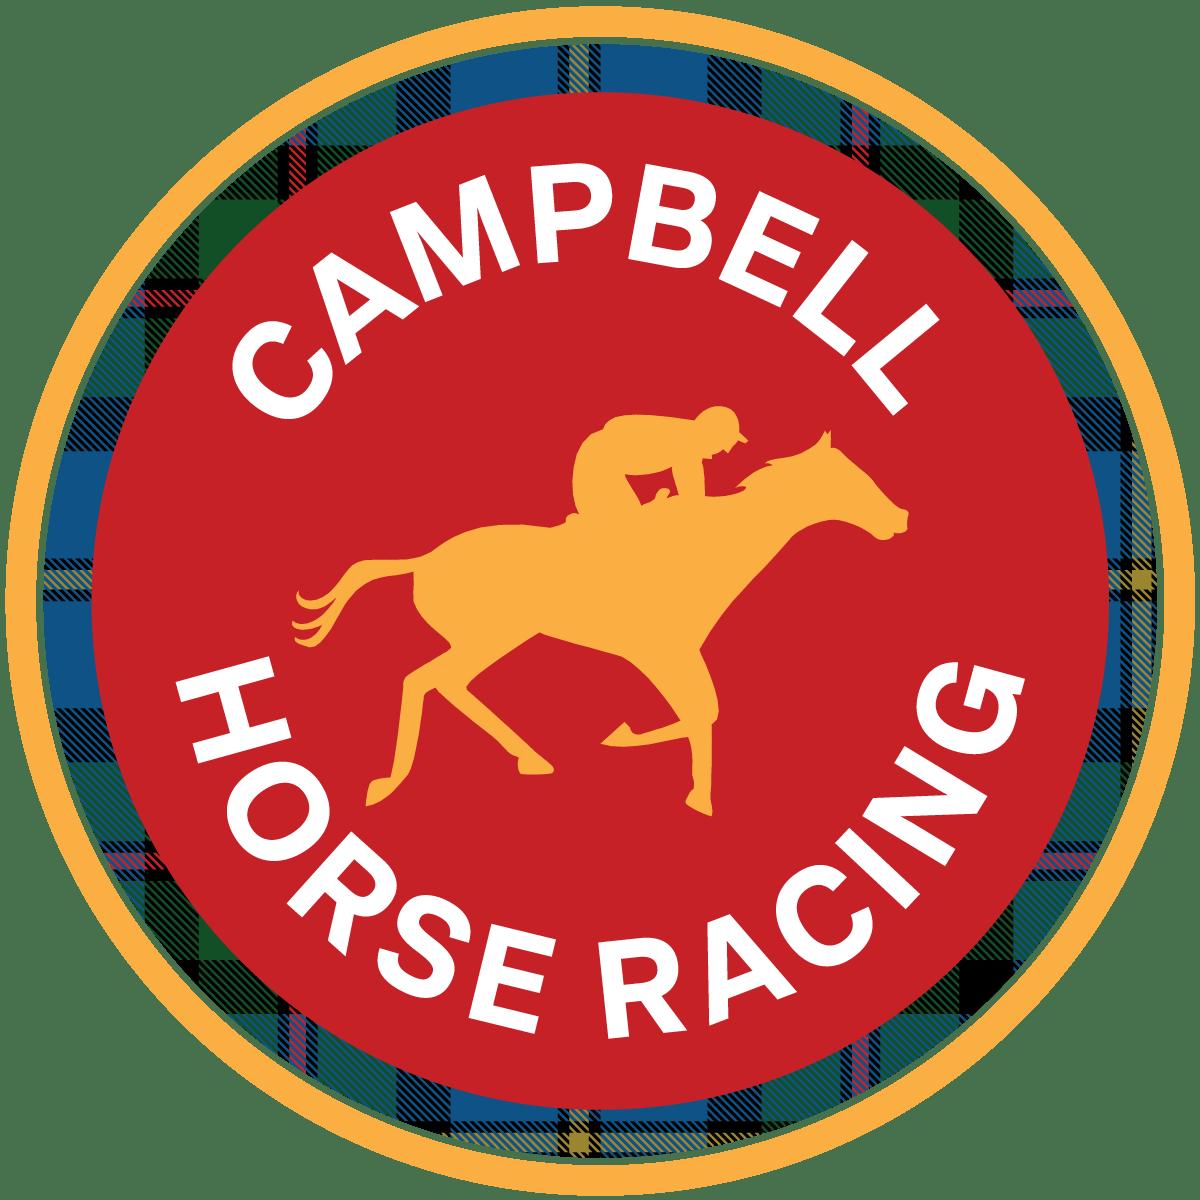 Campbell Horse Racing